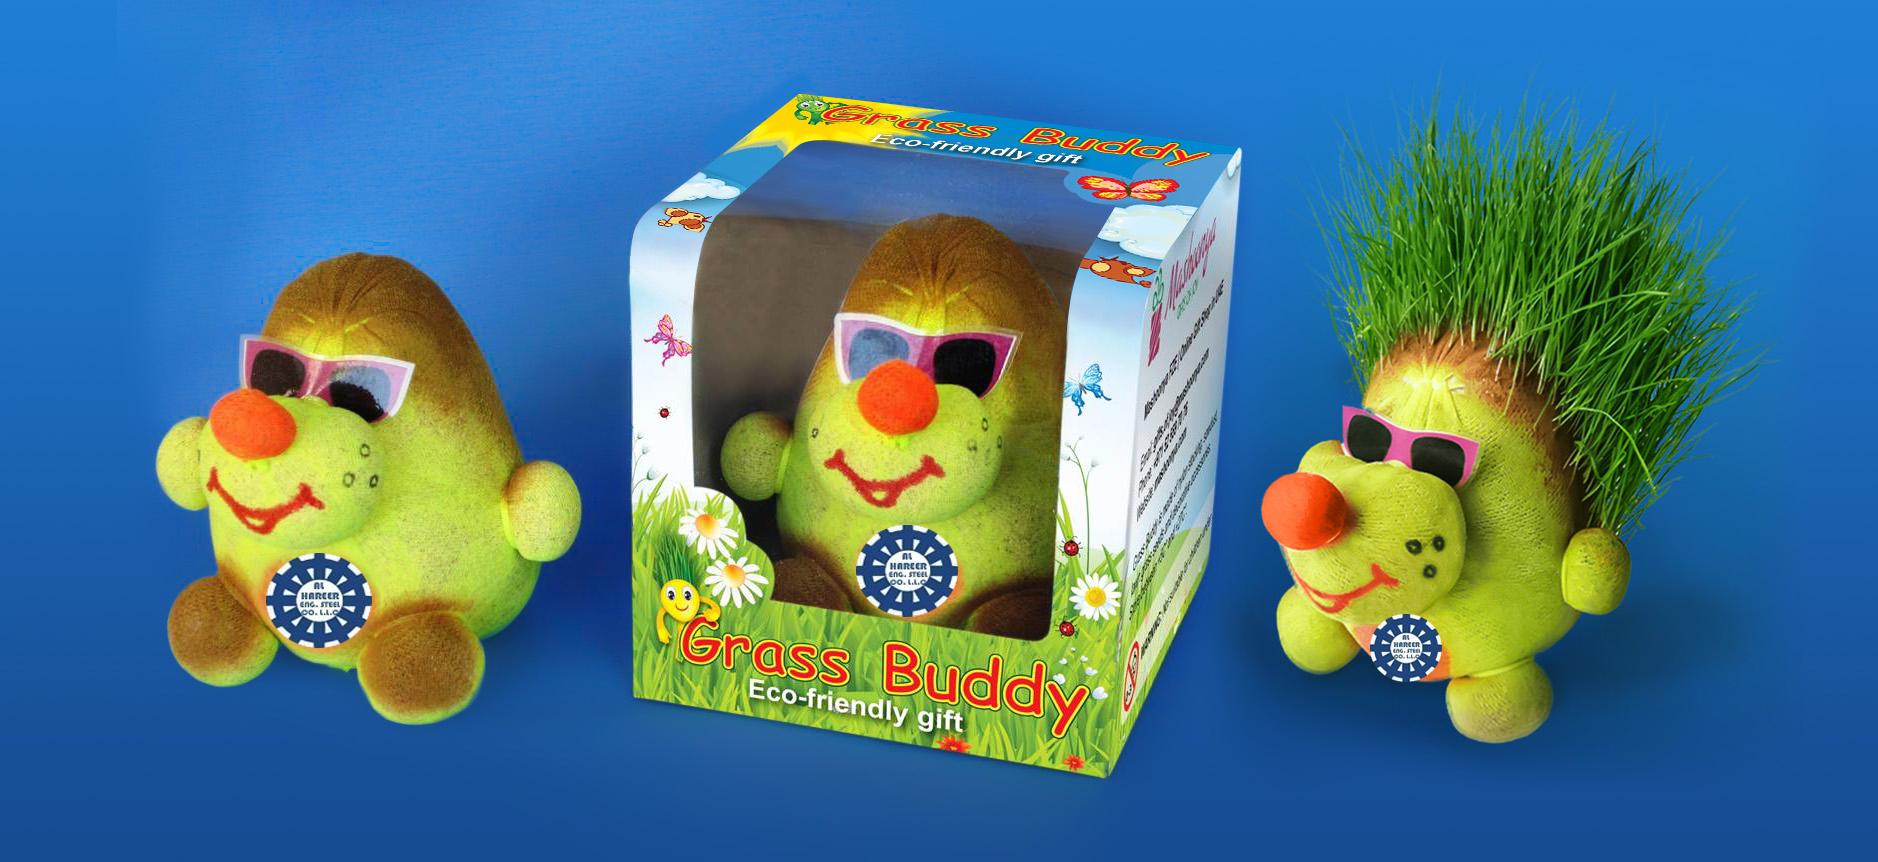 Grass Head - Unique Corporate Gifts